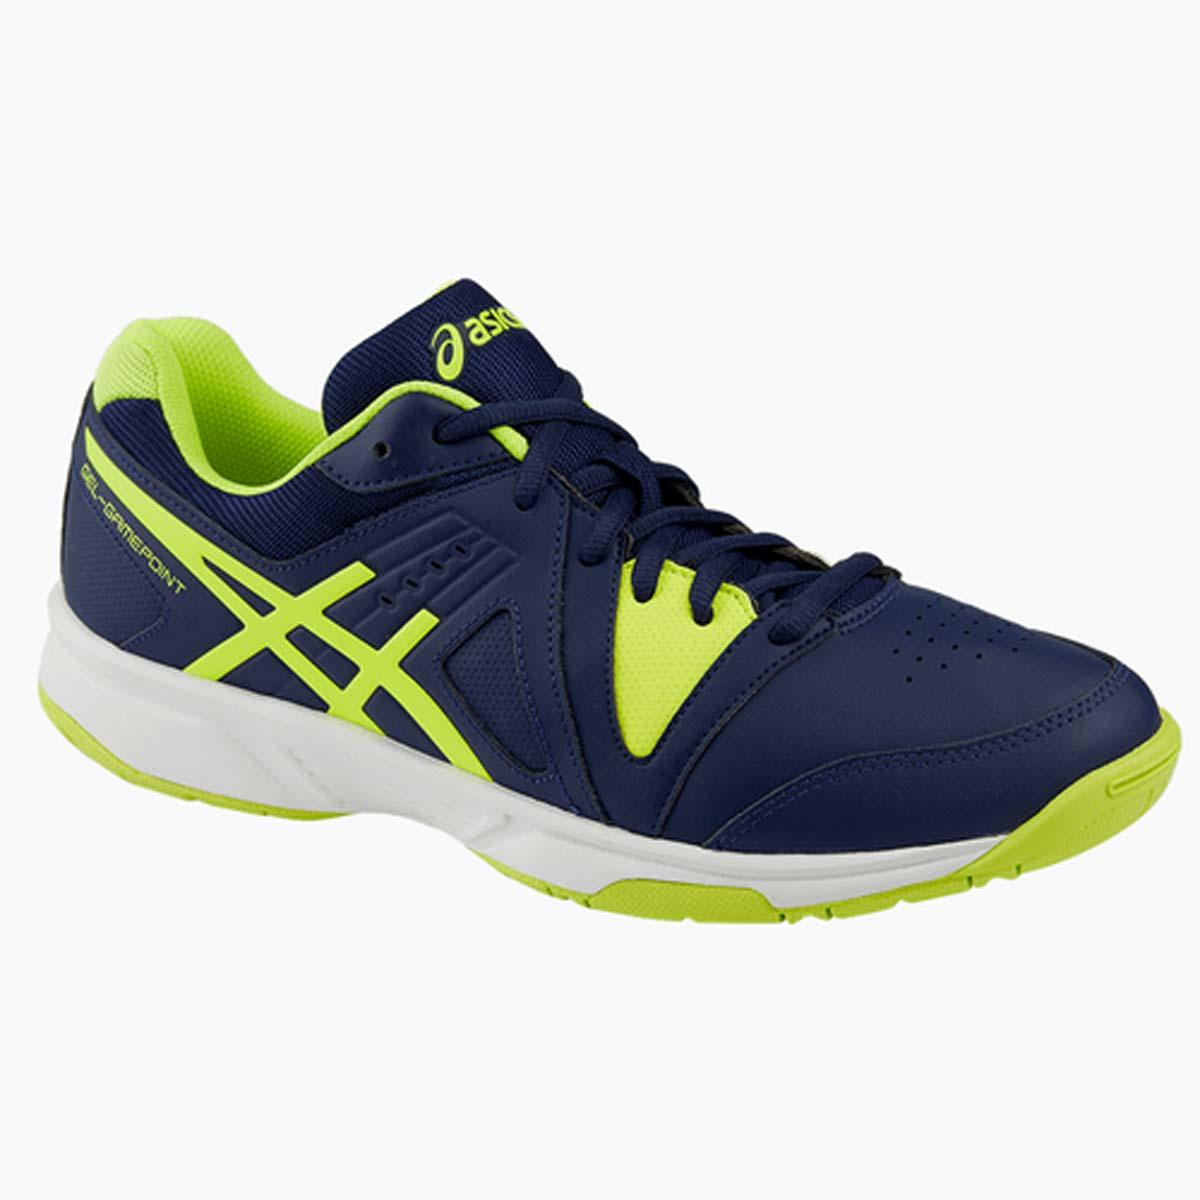 Asics Gel Gamepoint Tennis Shoes (Indigo BlueYellowWhite)